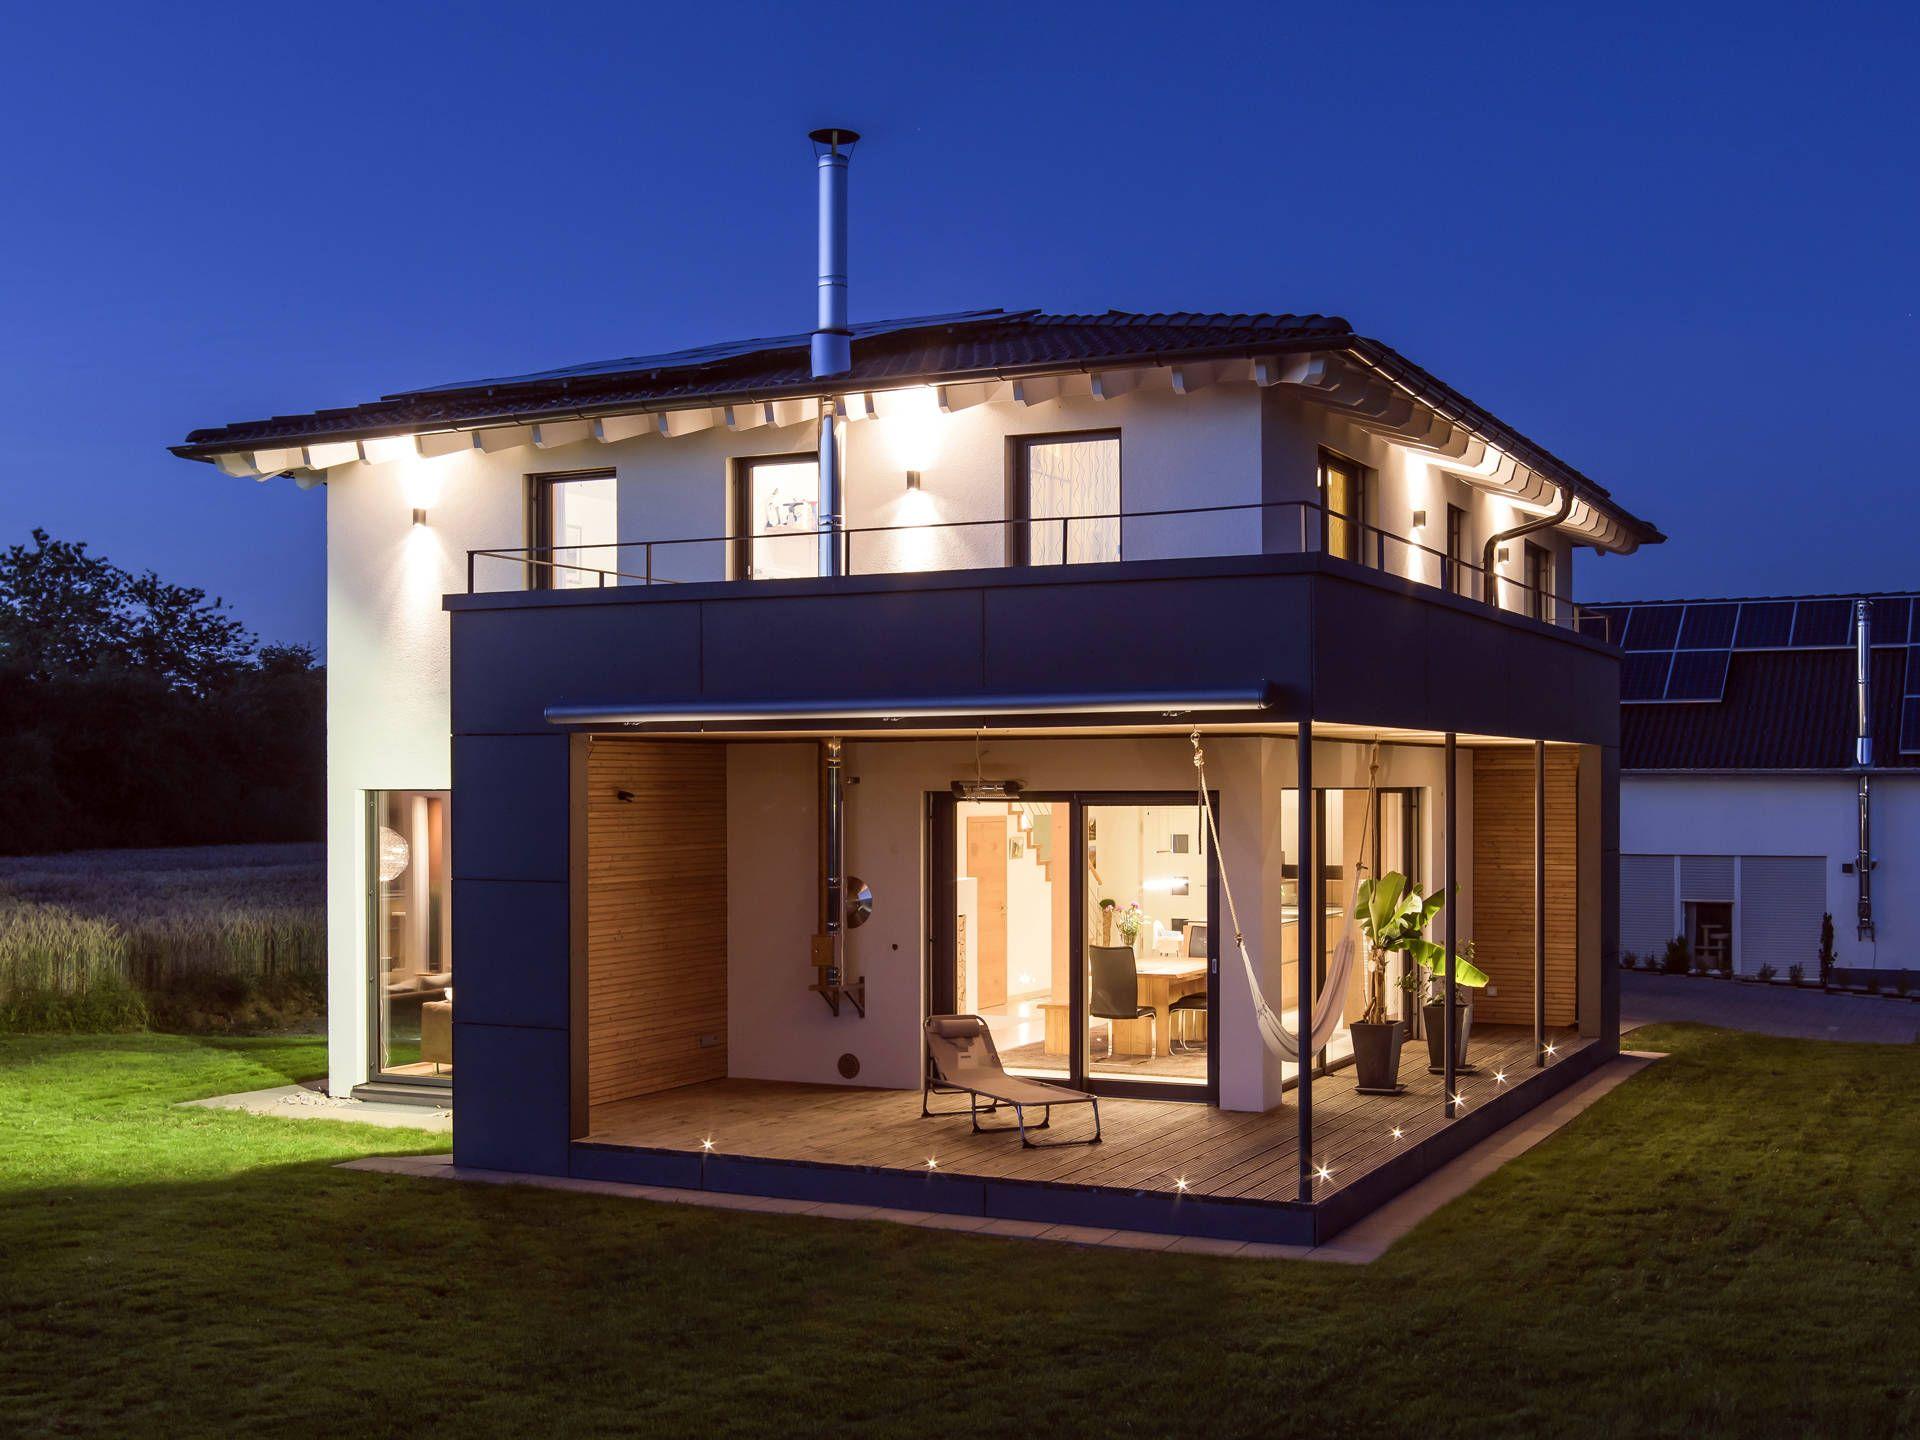 stadtvilla mit walmdach kitzlingerhaus dornhan kitzlingerhaus kohaus pinterest. Black Bedroom Furniture Sets. Home Design Ideas